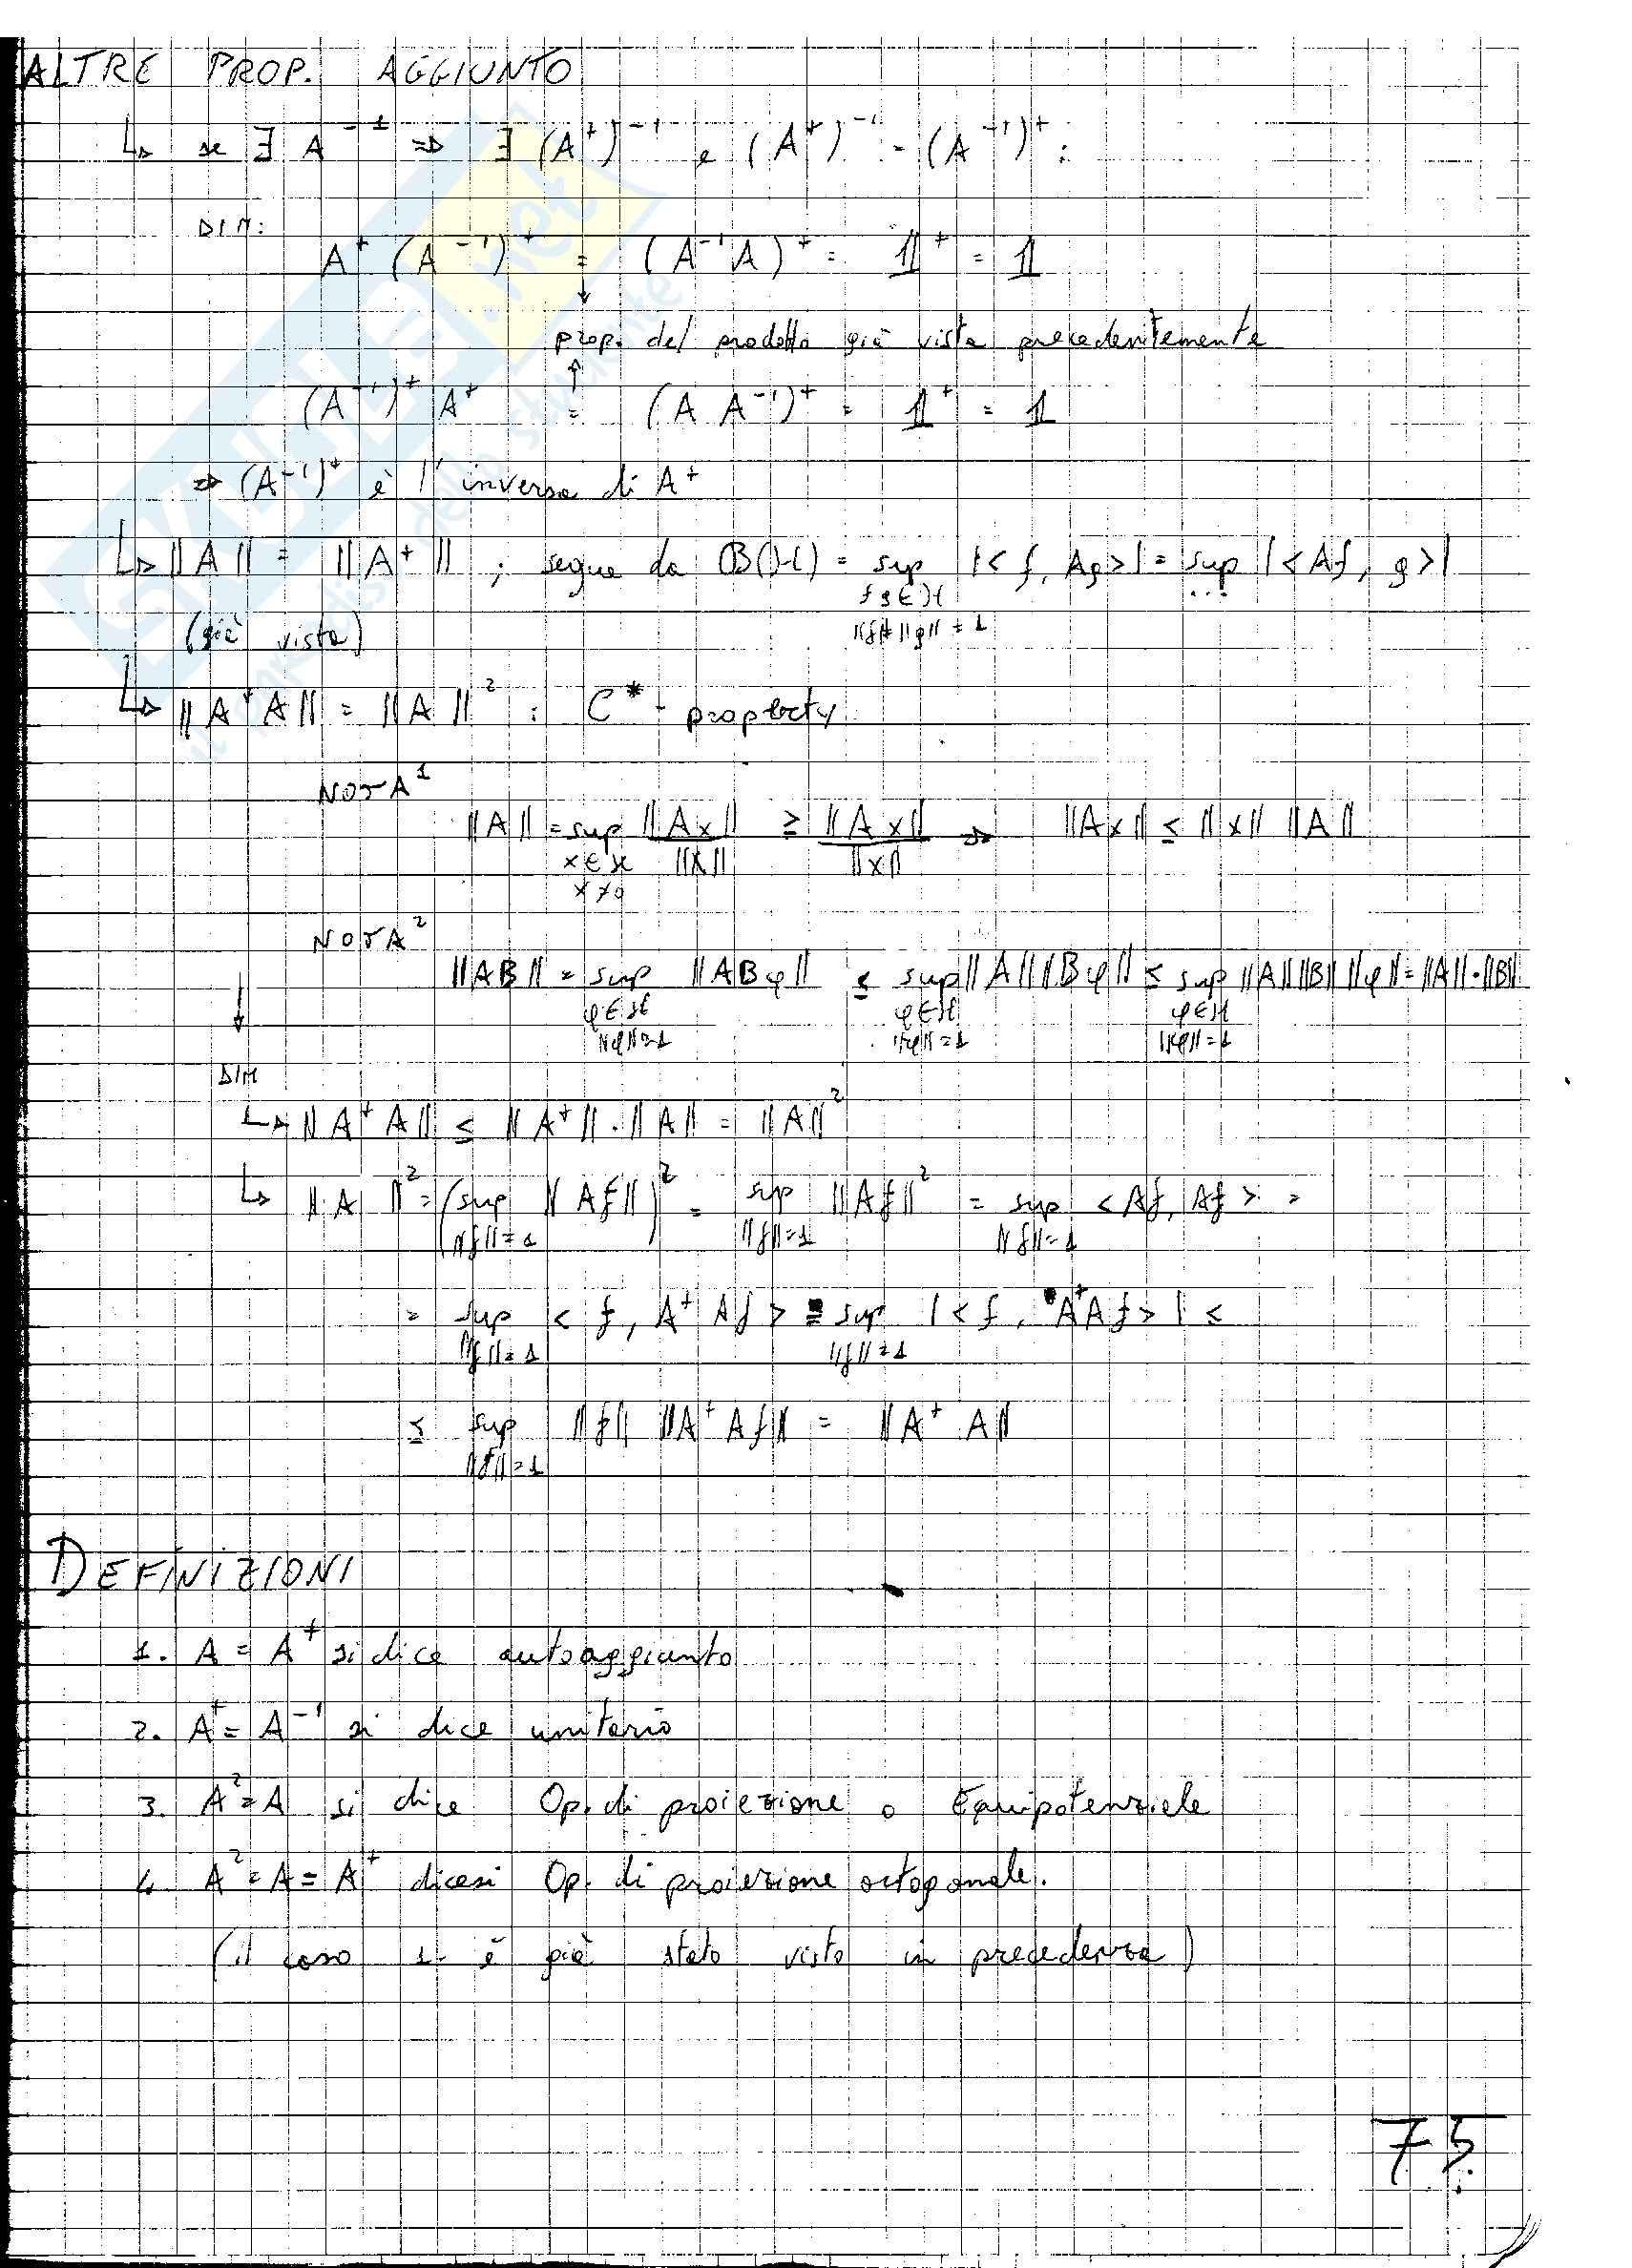 Fisica Matematica Pag. 76